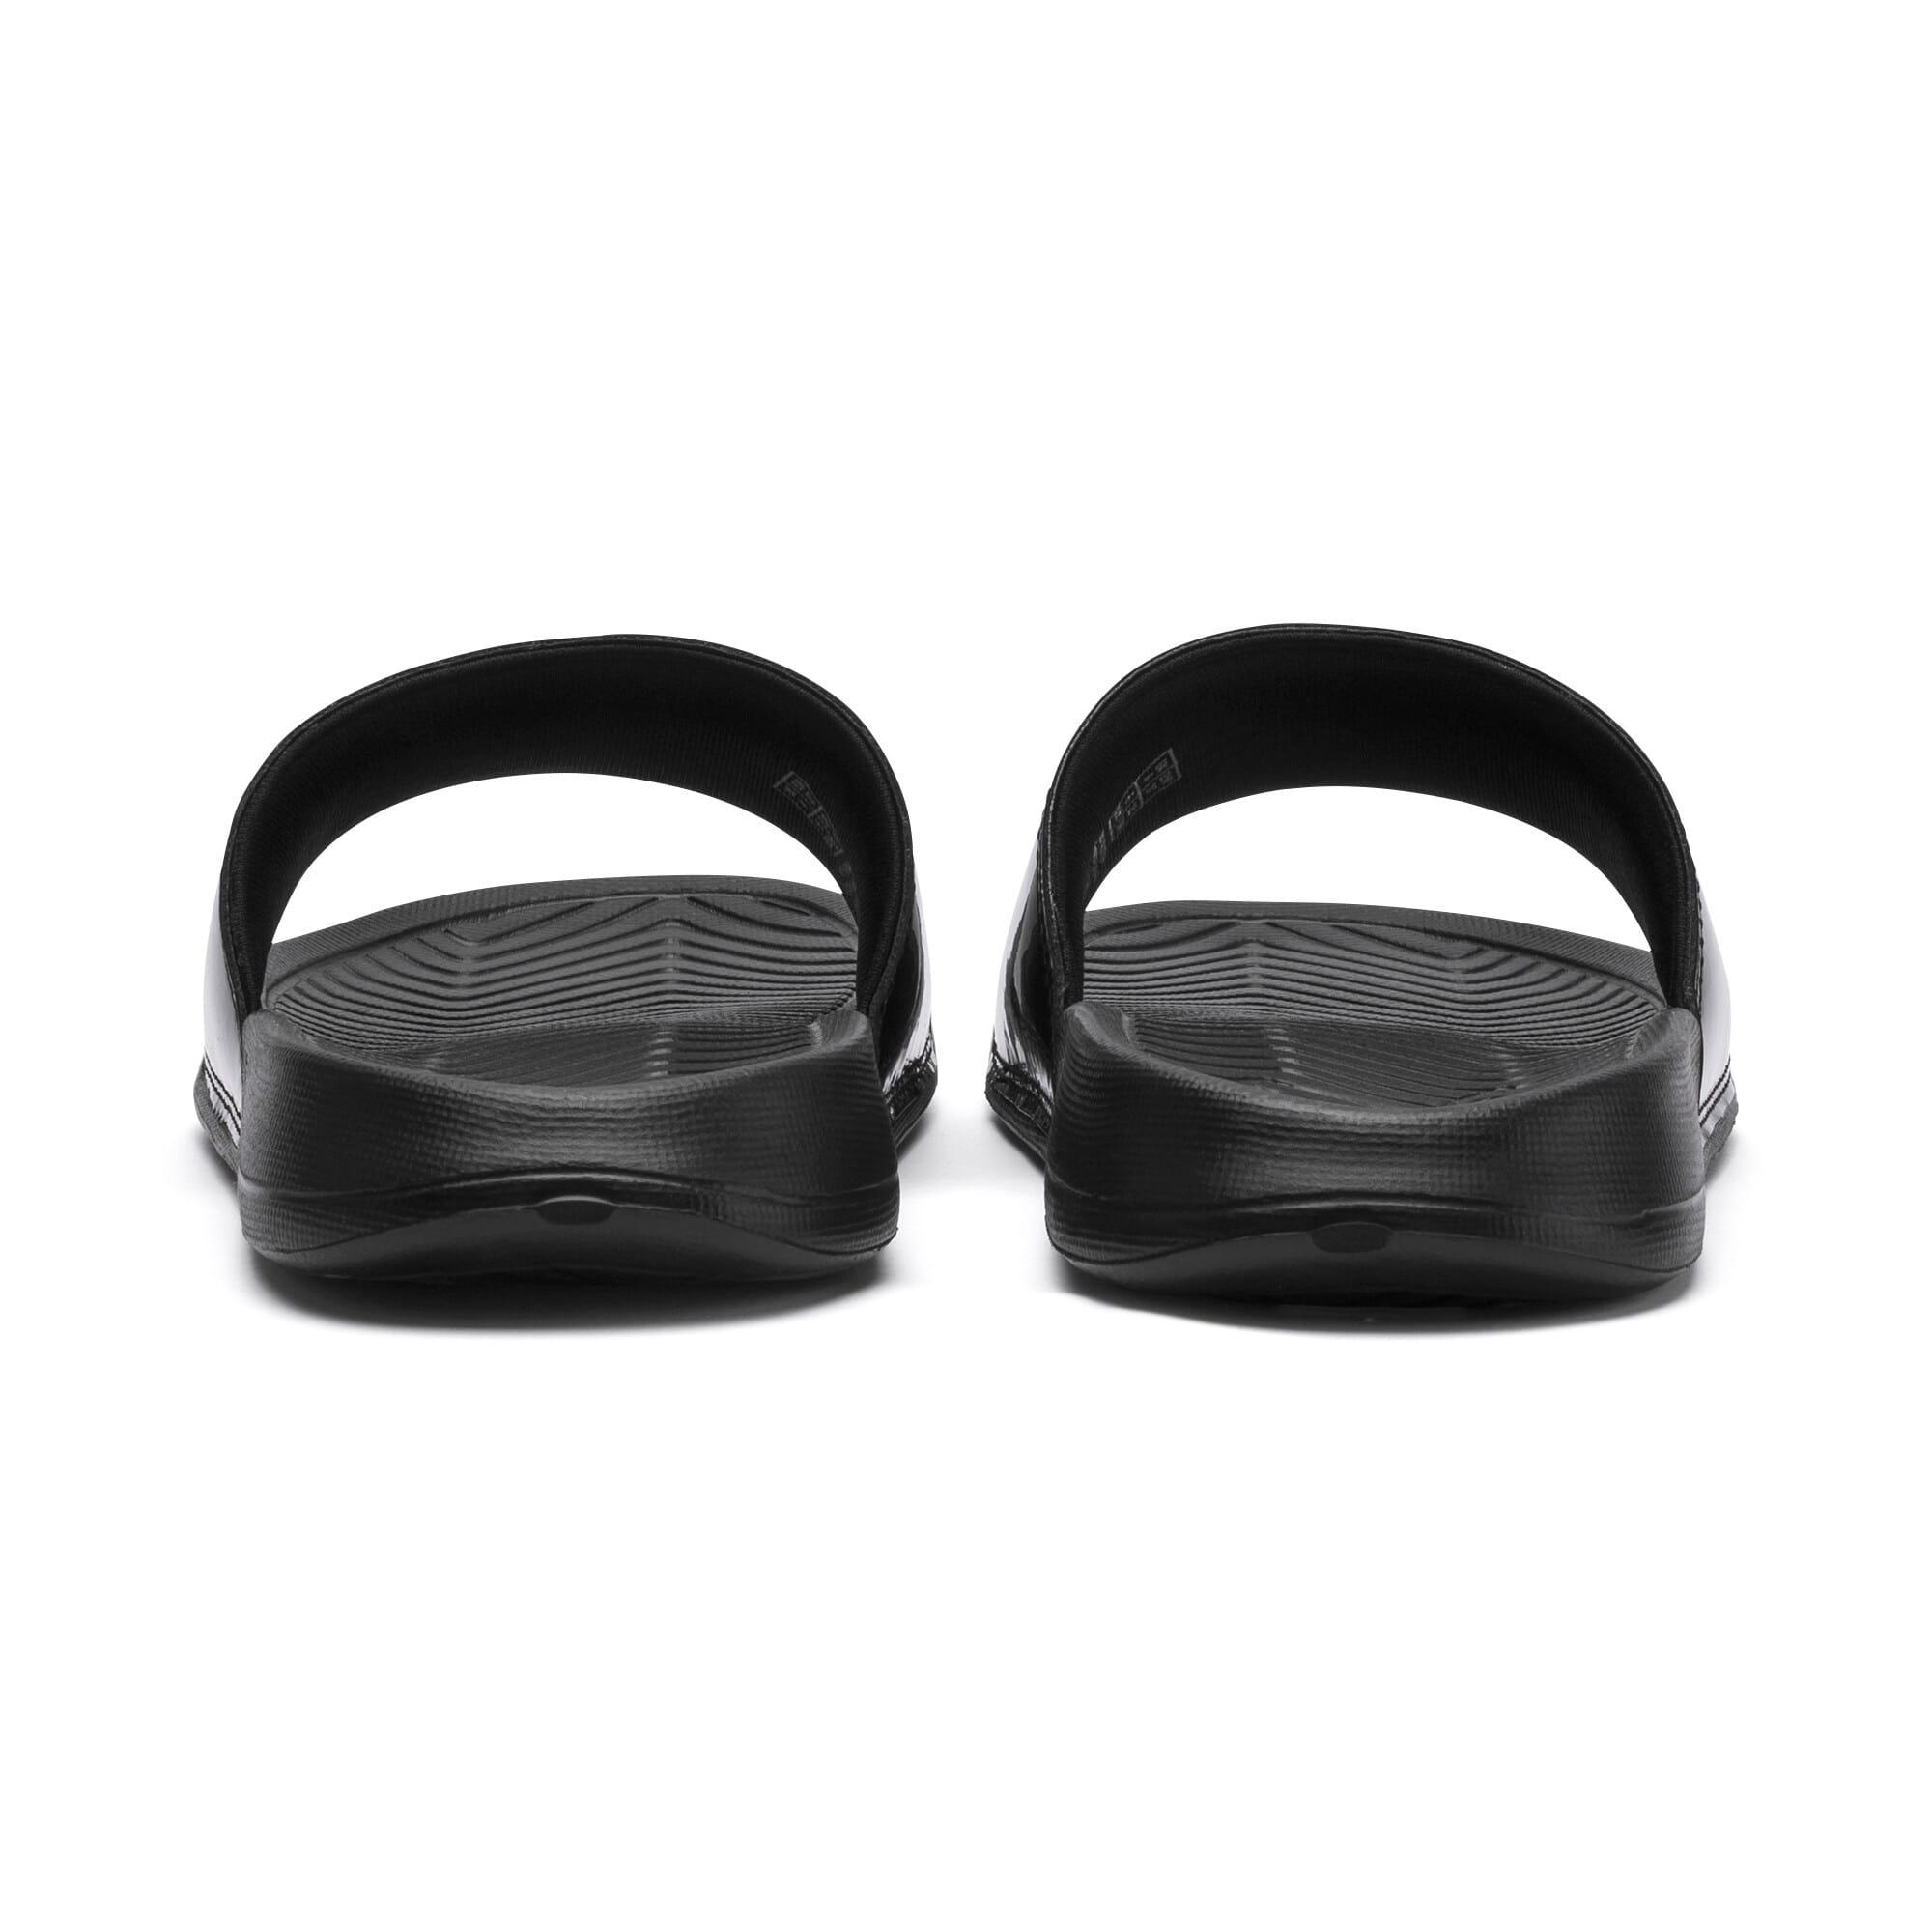 Thumbnail 3 of Popcat Patent Women's Sandals, Puma Black-Puma Black, medium